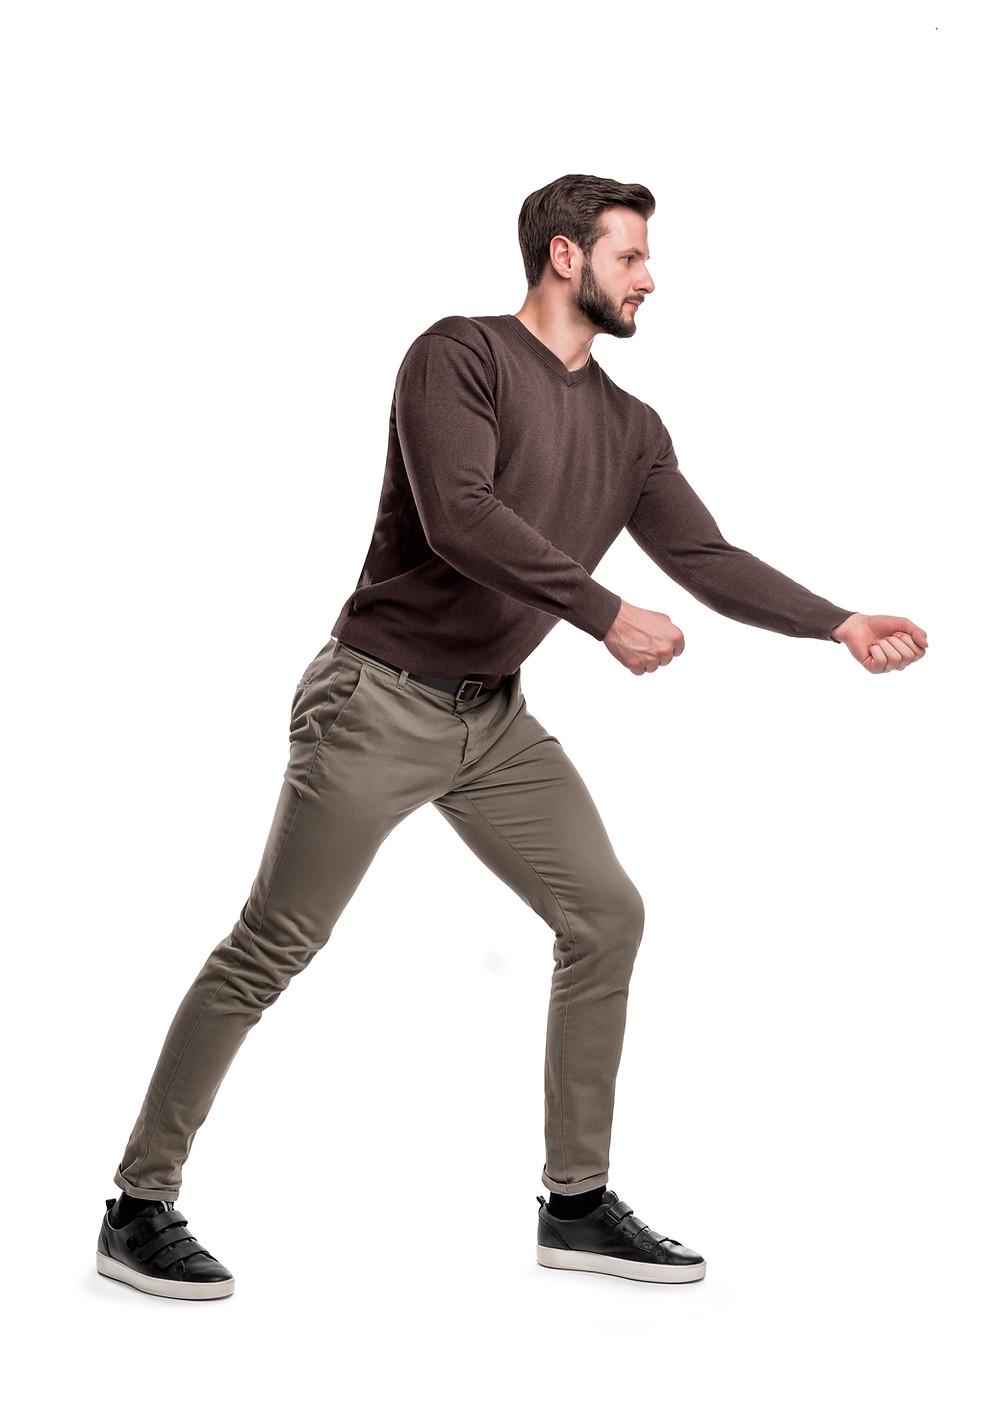 Grip Strength Man Pulling Imaginary Rope Chiropractic Melbourne Prahran Windsor 3181